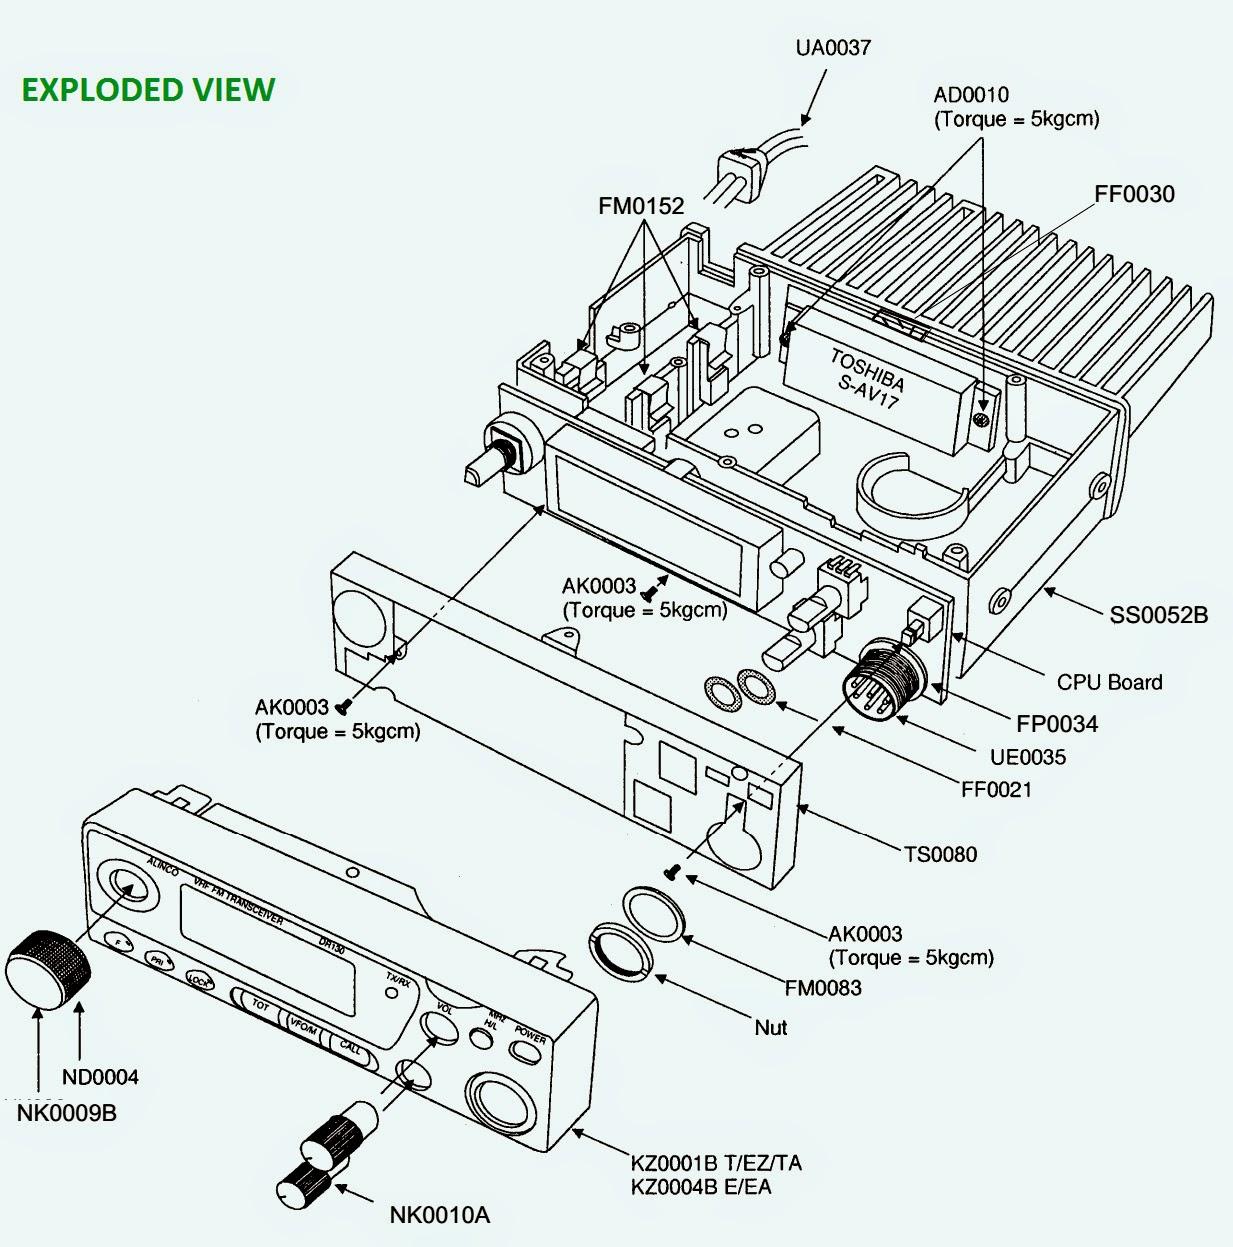 Lithonia Ps300 Wiring Diagram